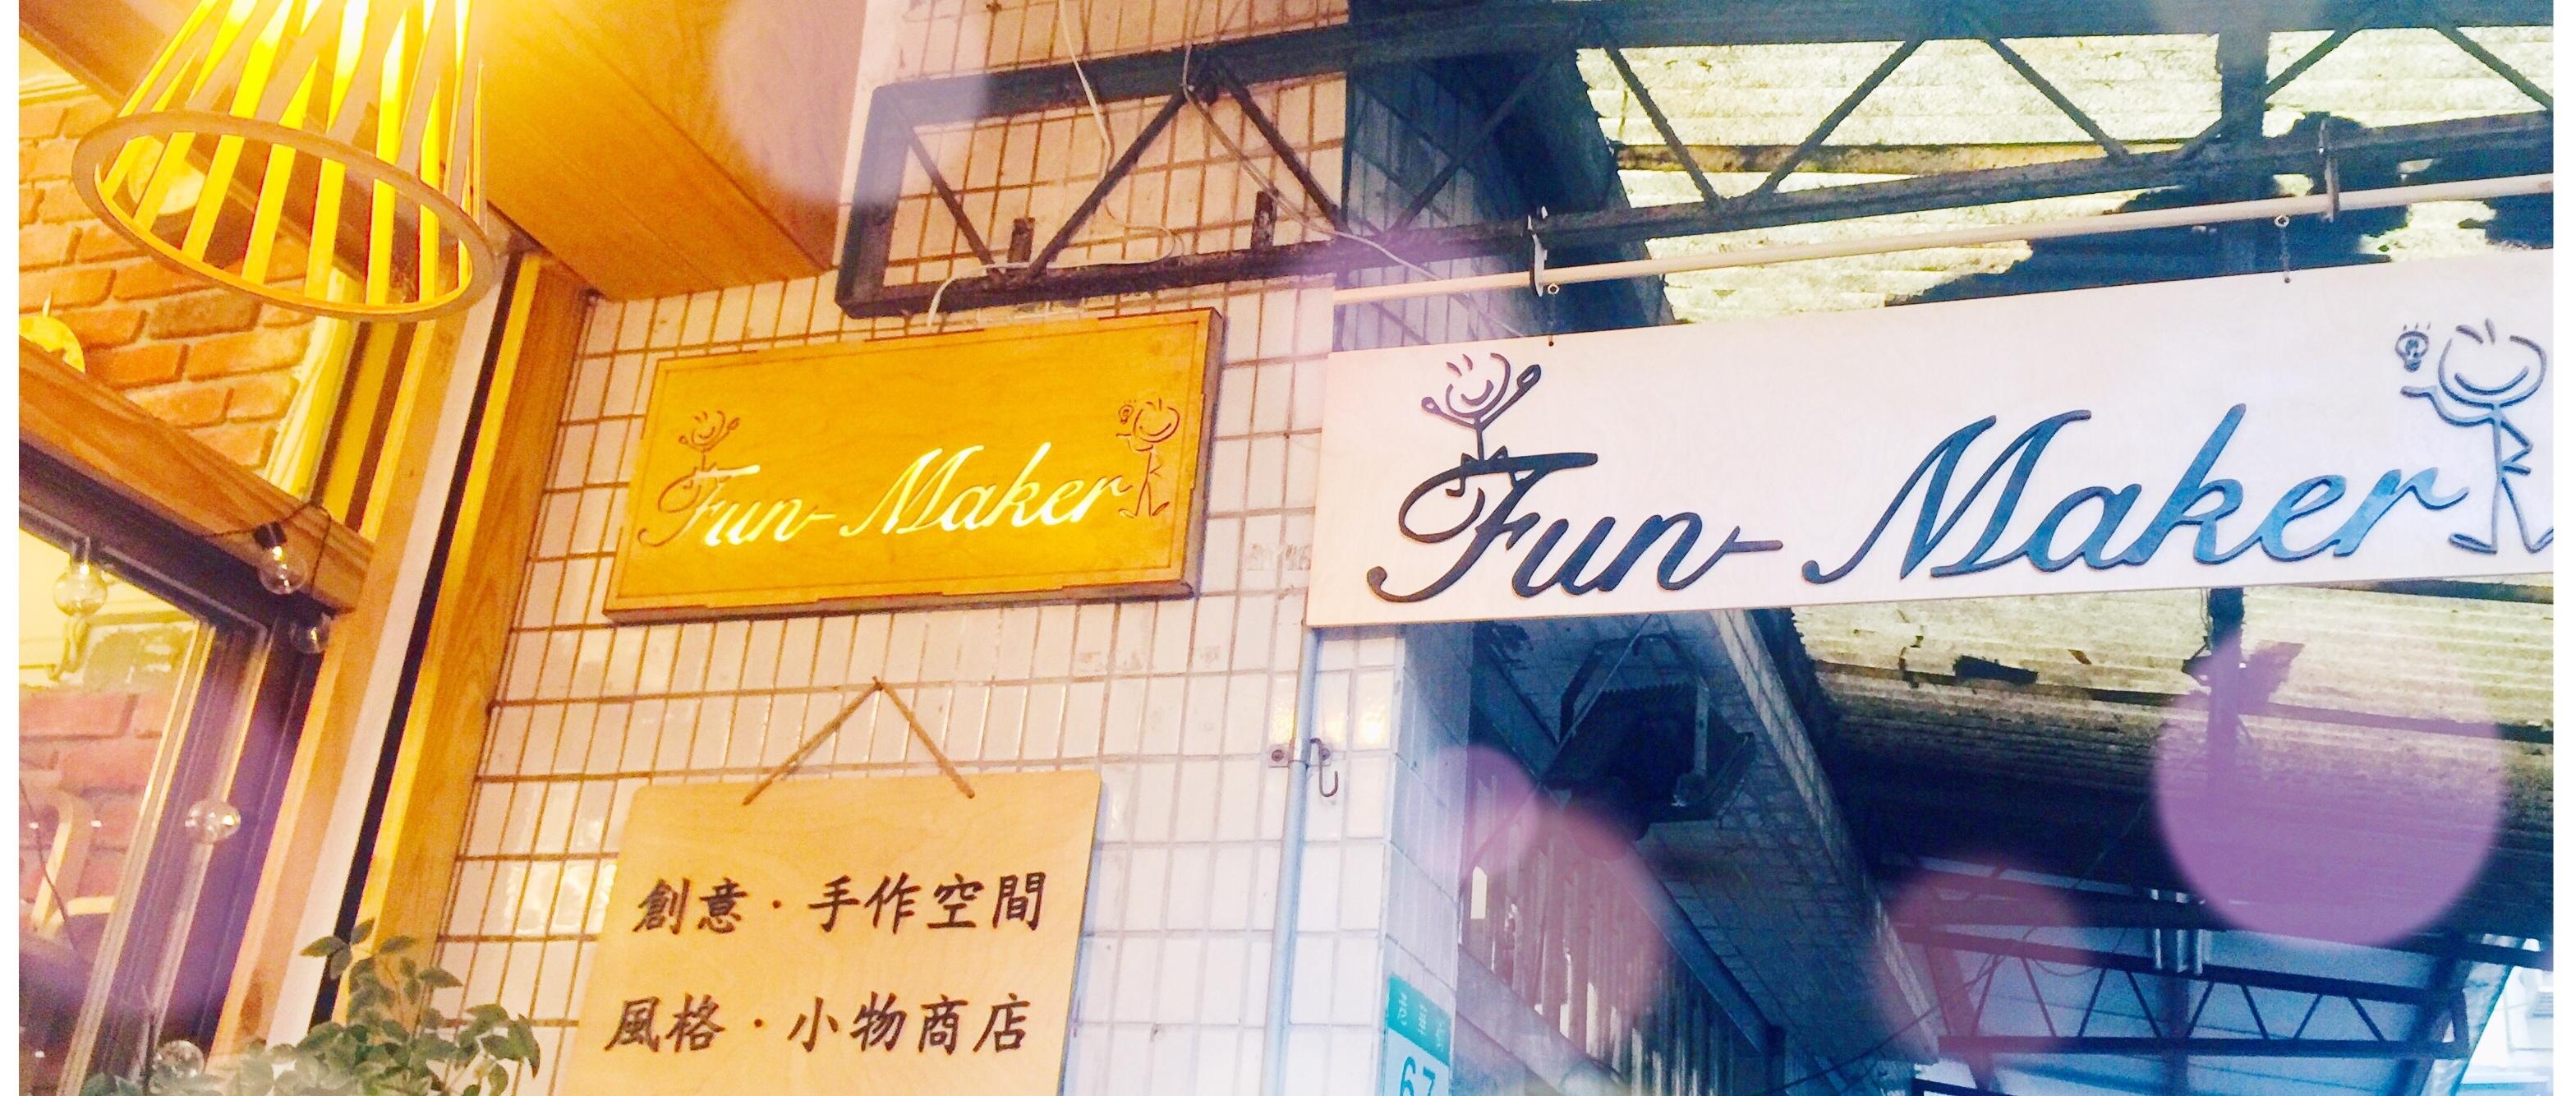 fun maker